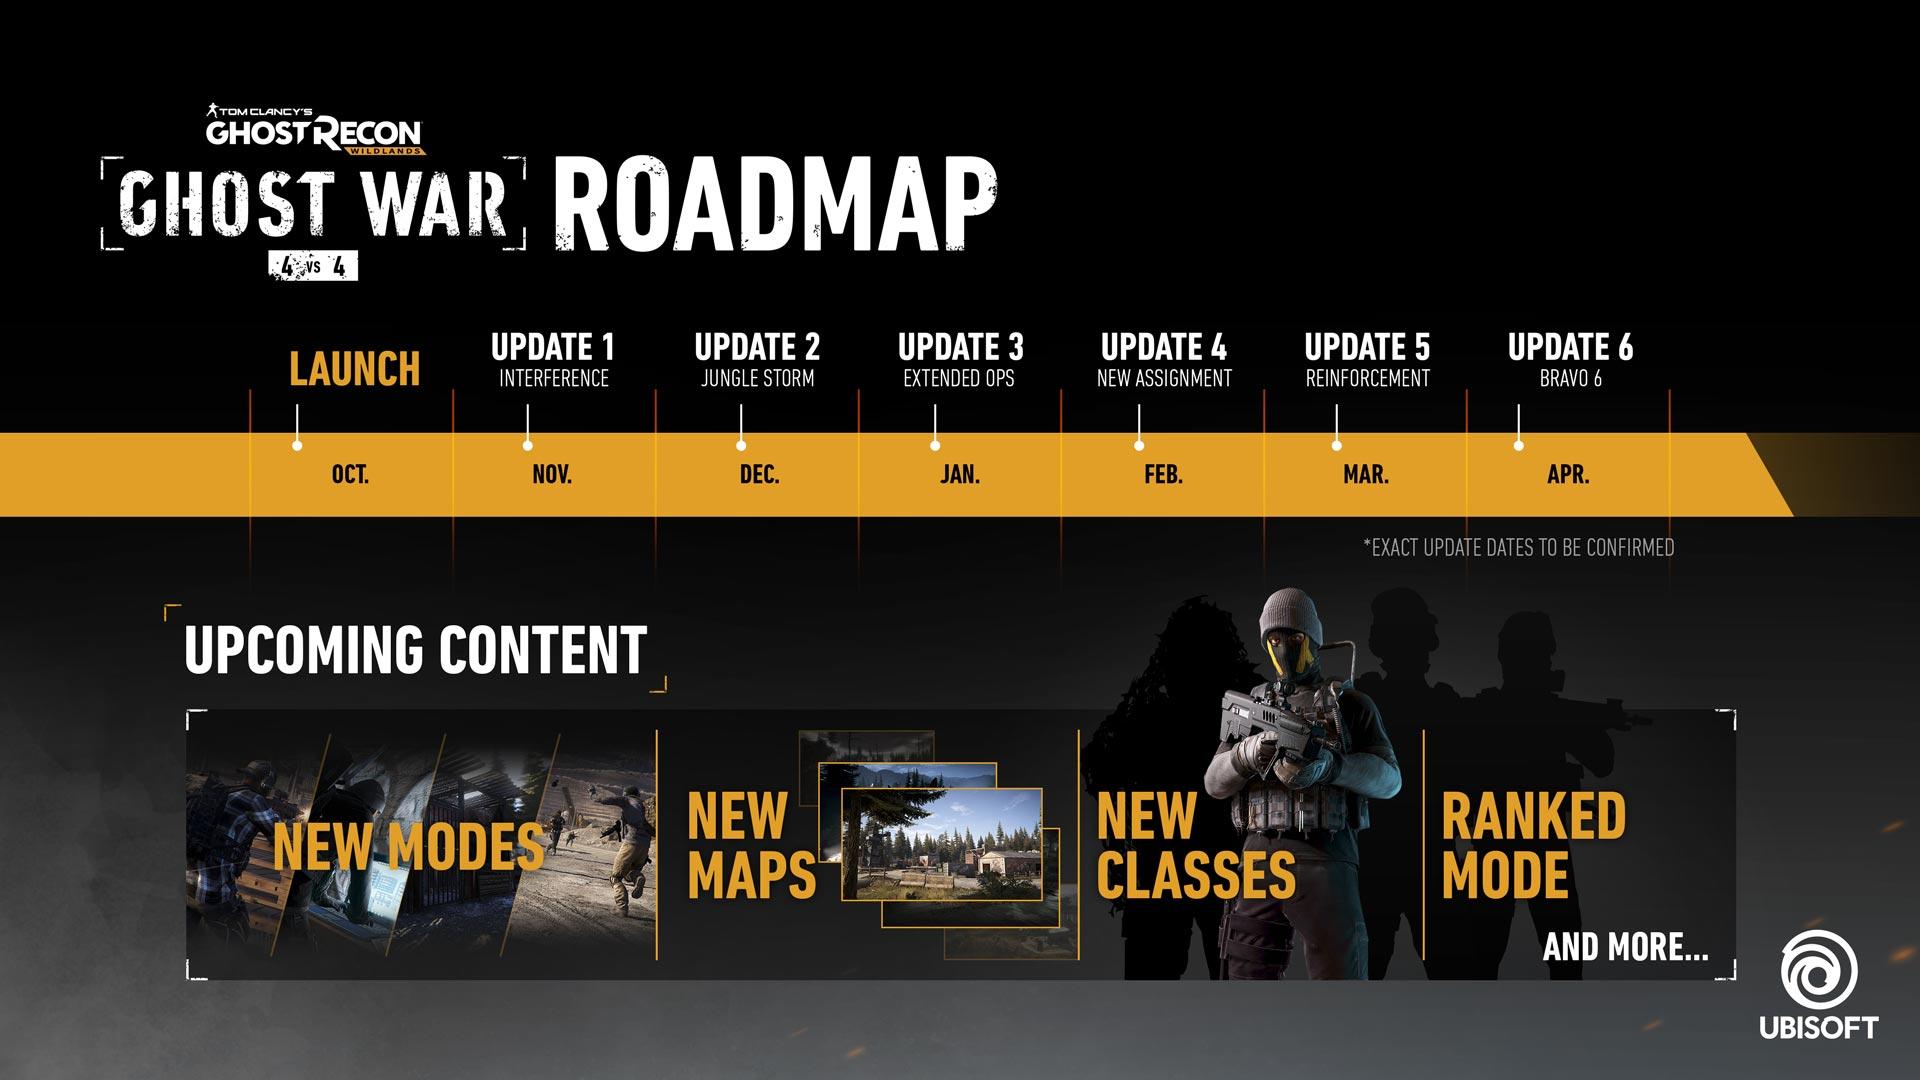 Calendario Ubisoft.Ubisoft Revelo Calendario De Updates Para Ghost Recon